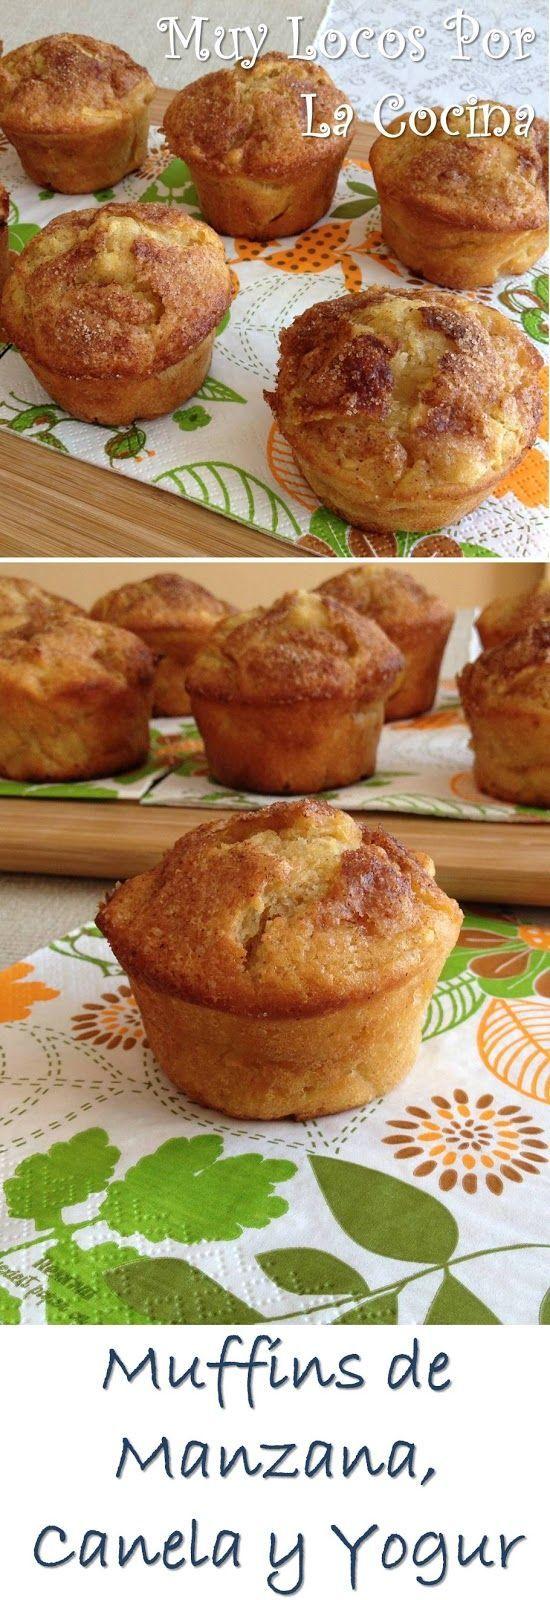 Muffins de Manzana, Canela y Yogur